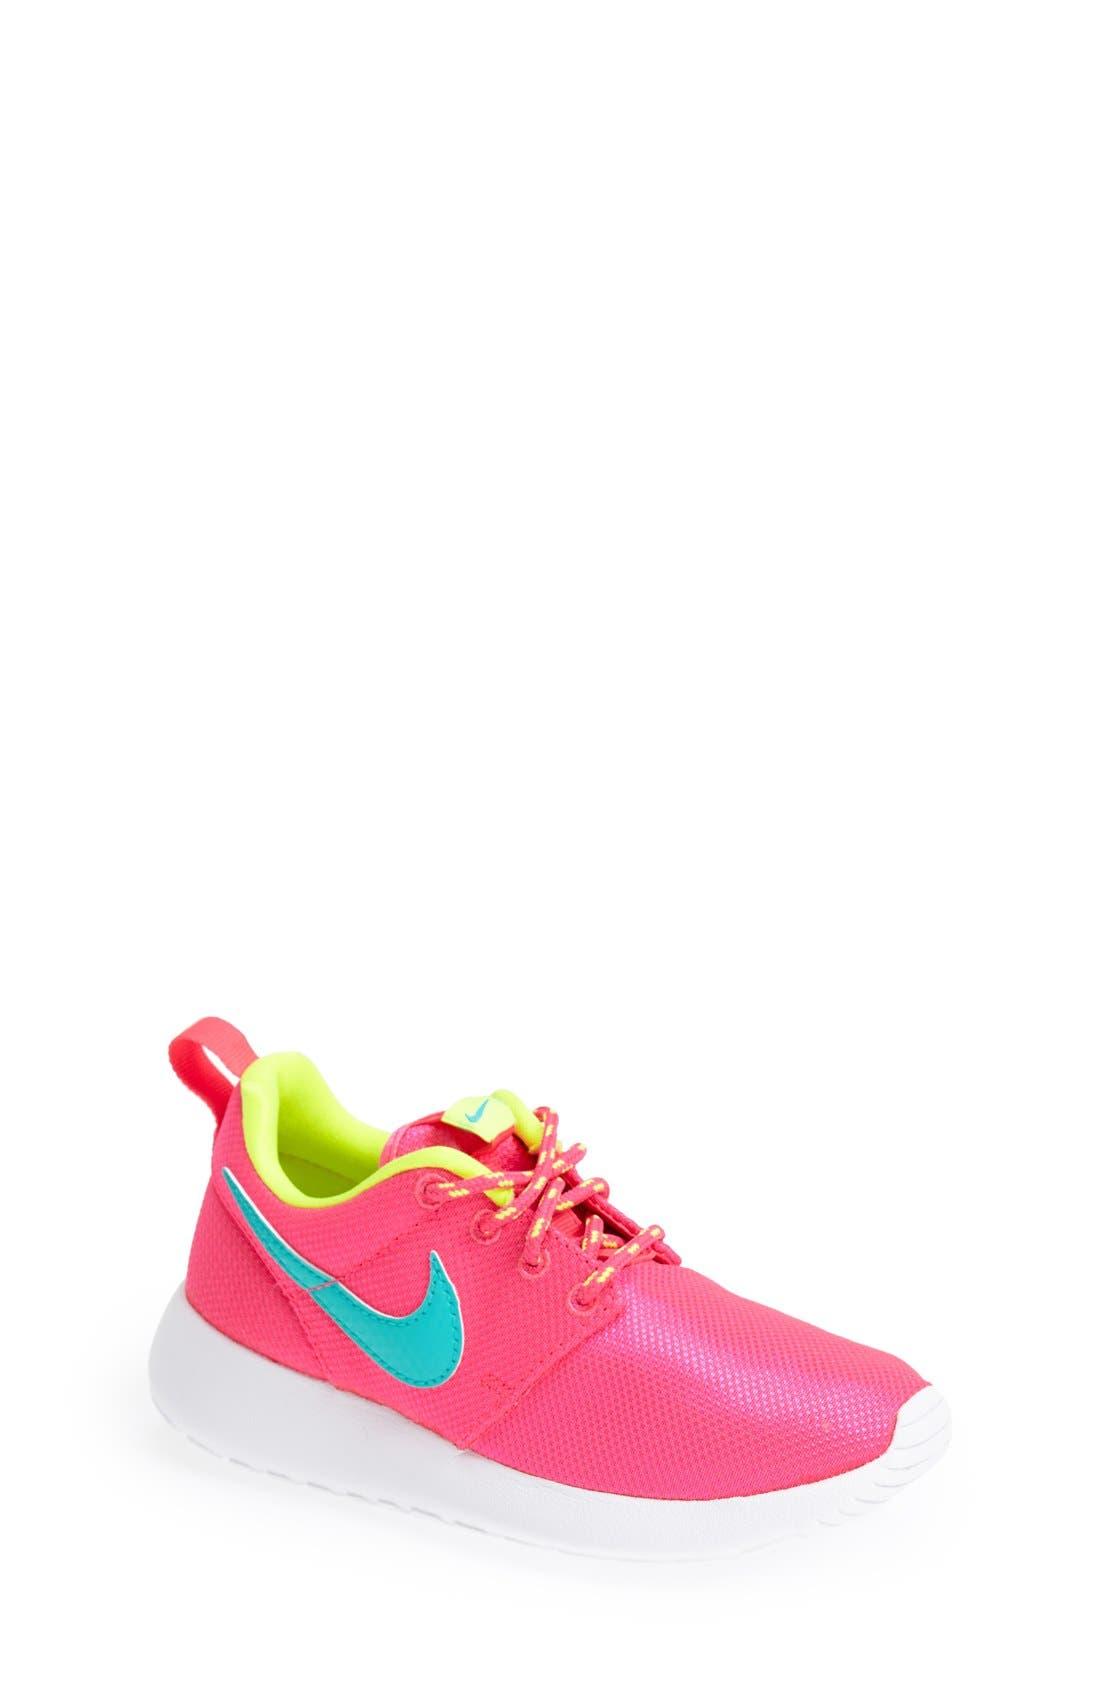 'Roshe Run' Athletic Shoe,                             Main thumbnail 45, color,